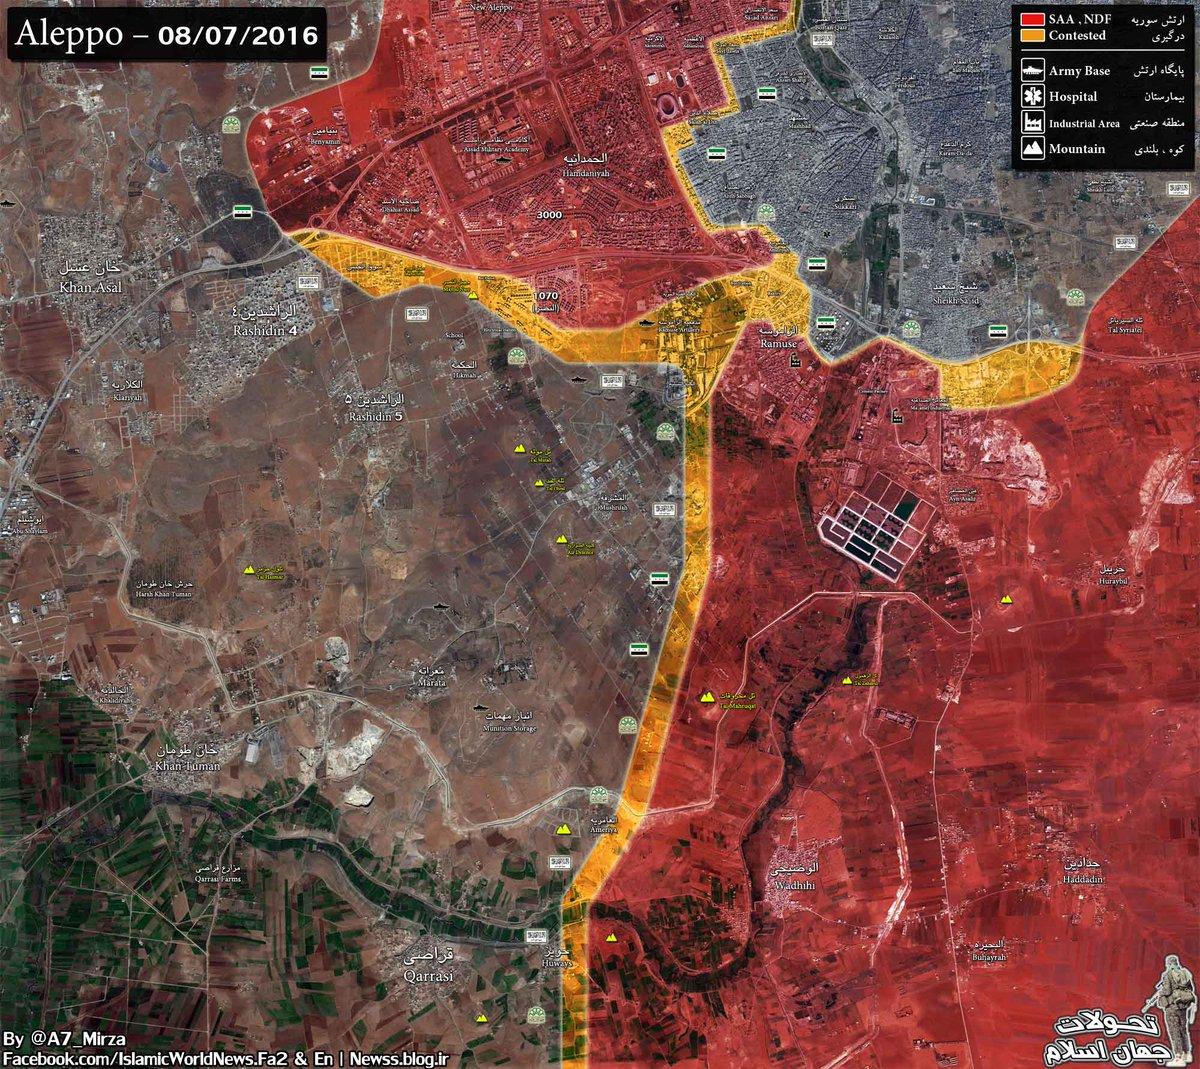 Syrian Civil War: News #9 - Page 4 CpNaiVUWYAAeZJd